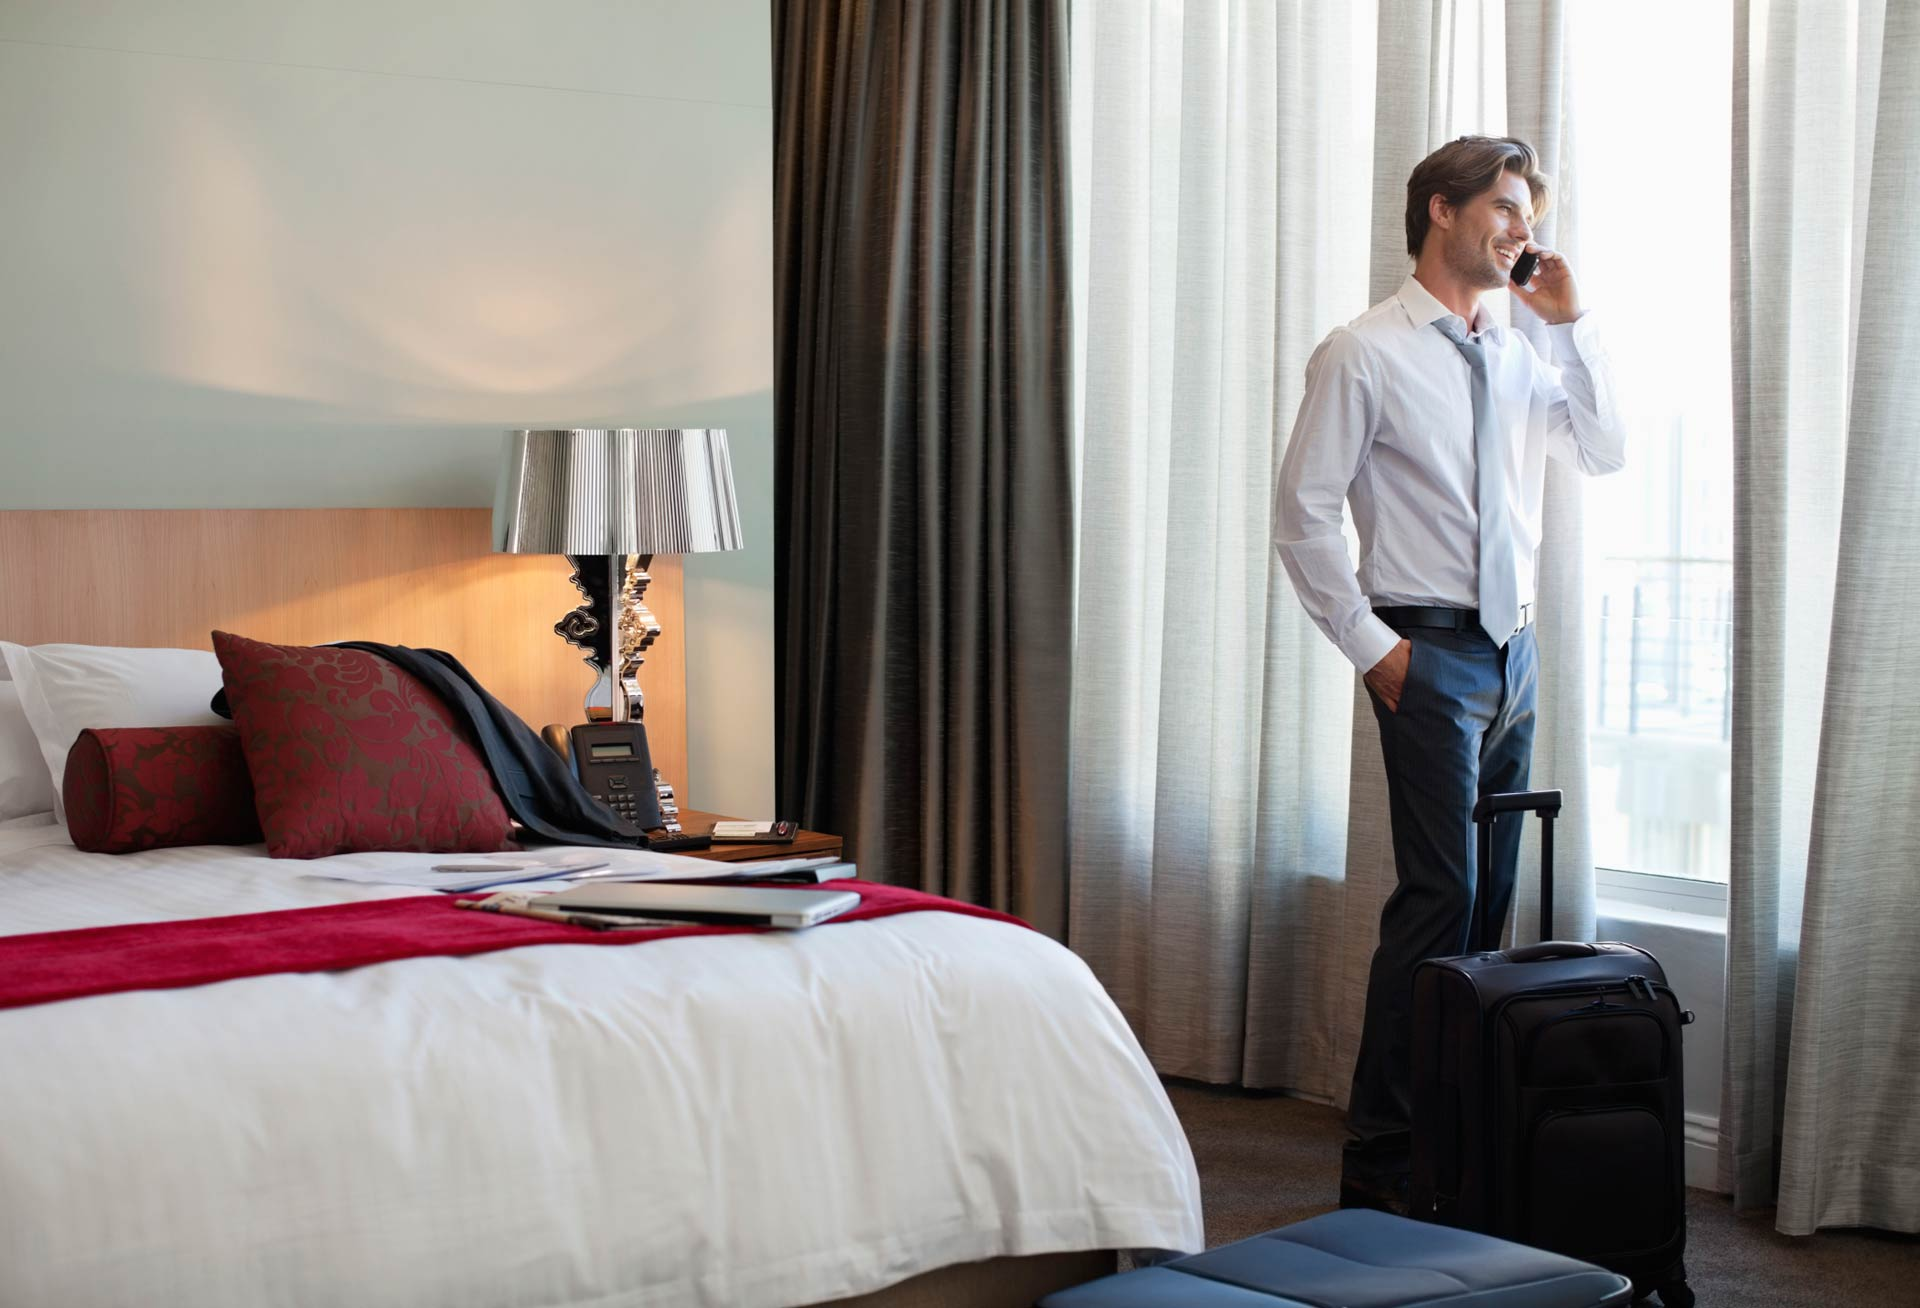 Pasajero corporativo en hotel